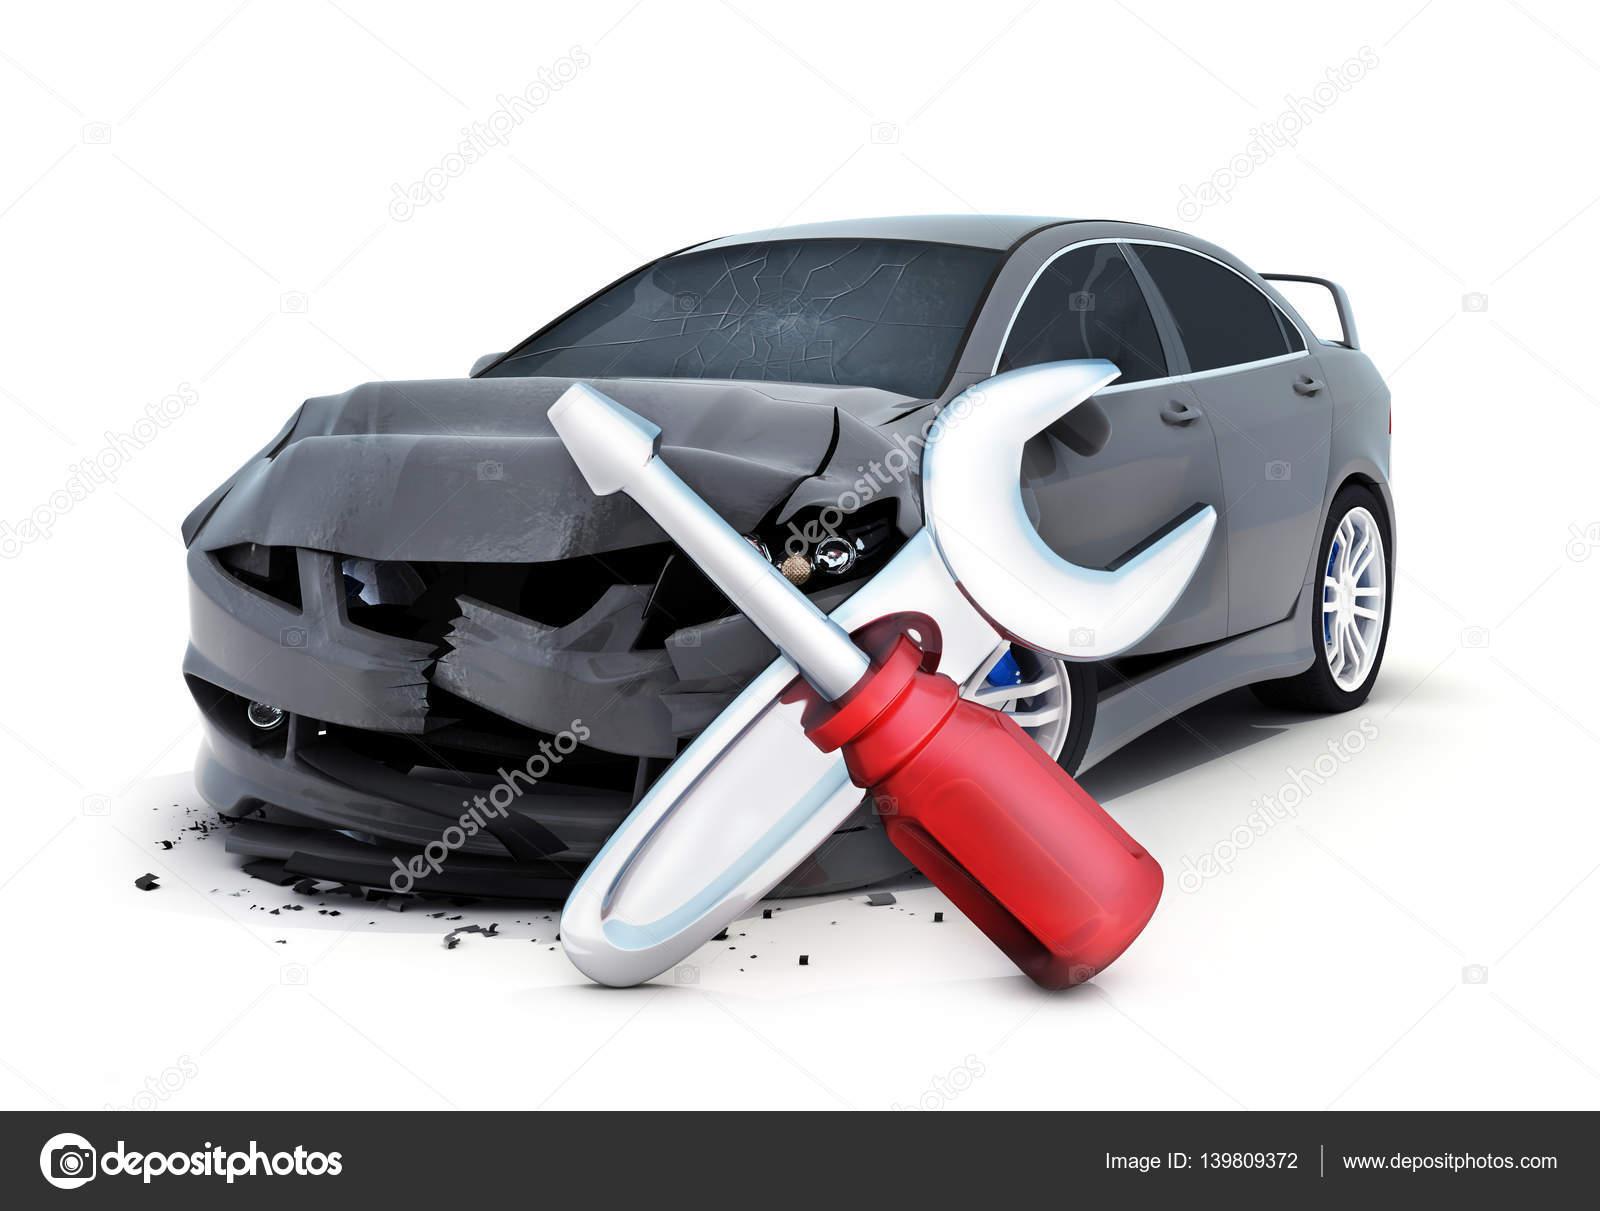 Autounfall und Reparatur Symbol — Stockfoto © Vladru #139809372